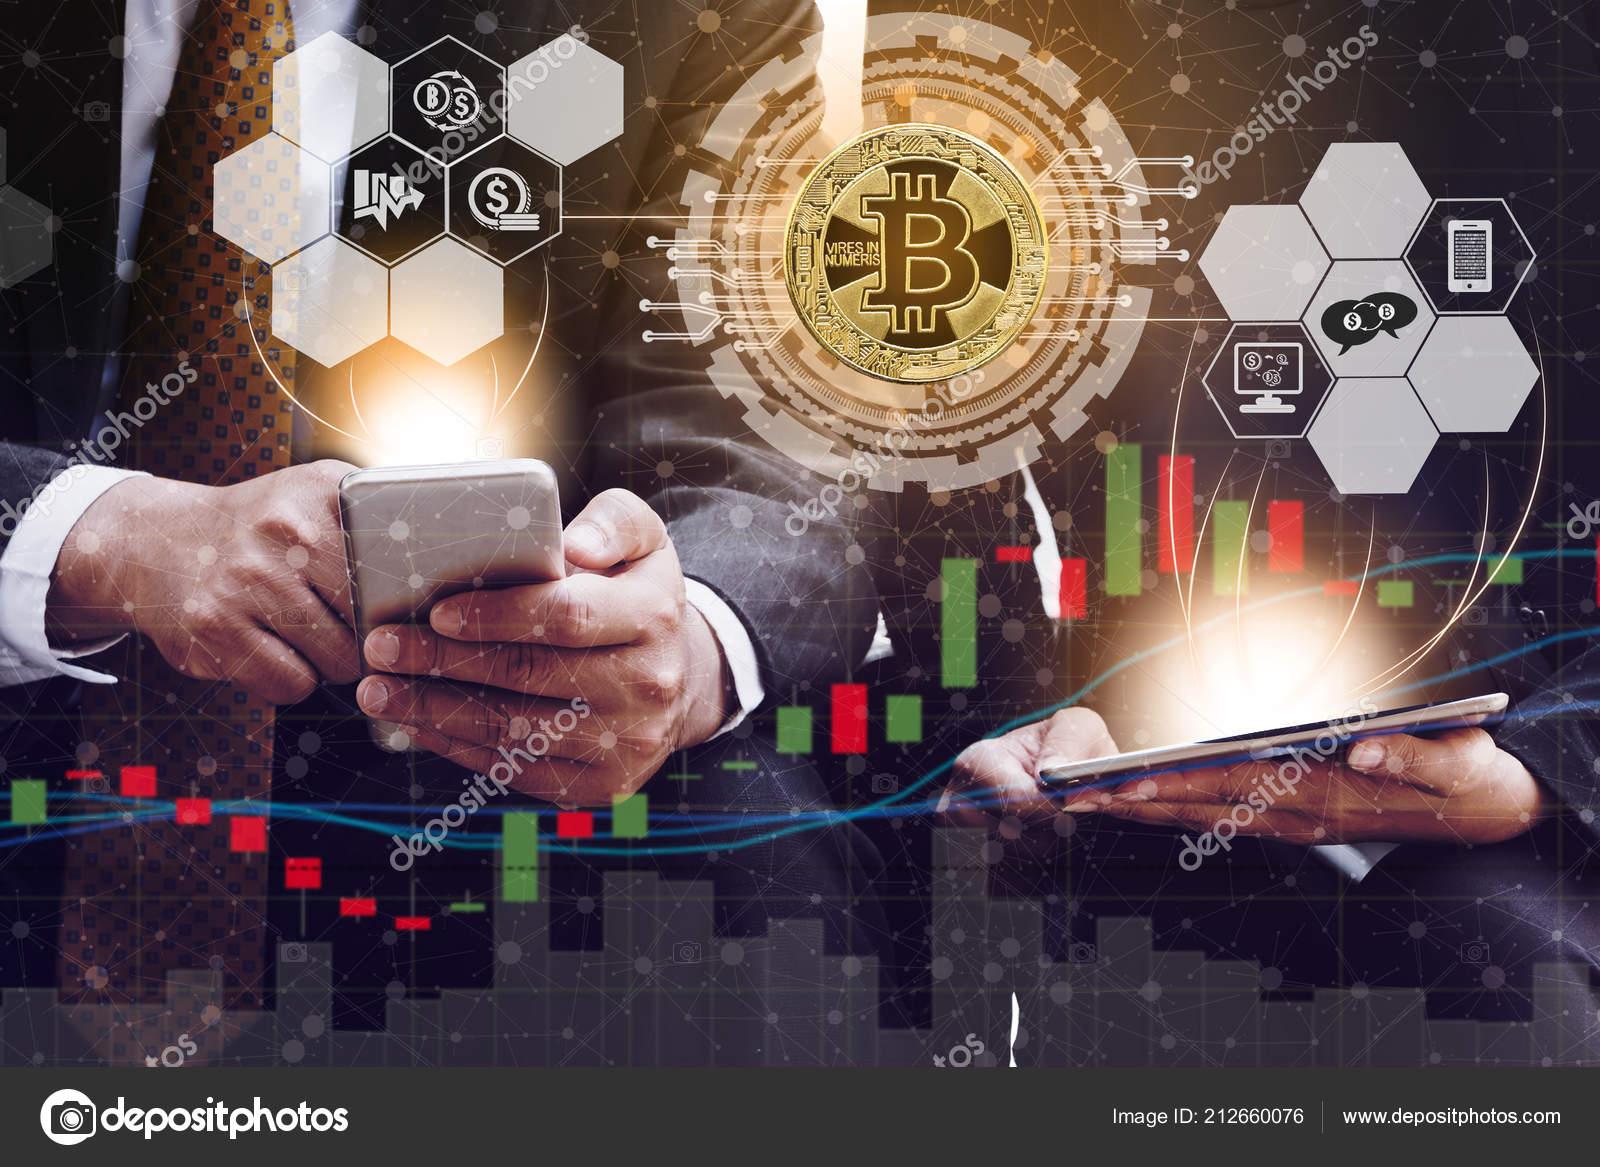 bitcoin price last may 2017